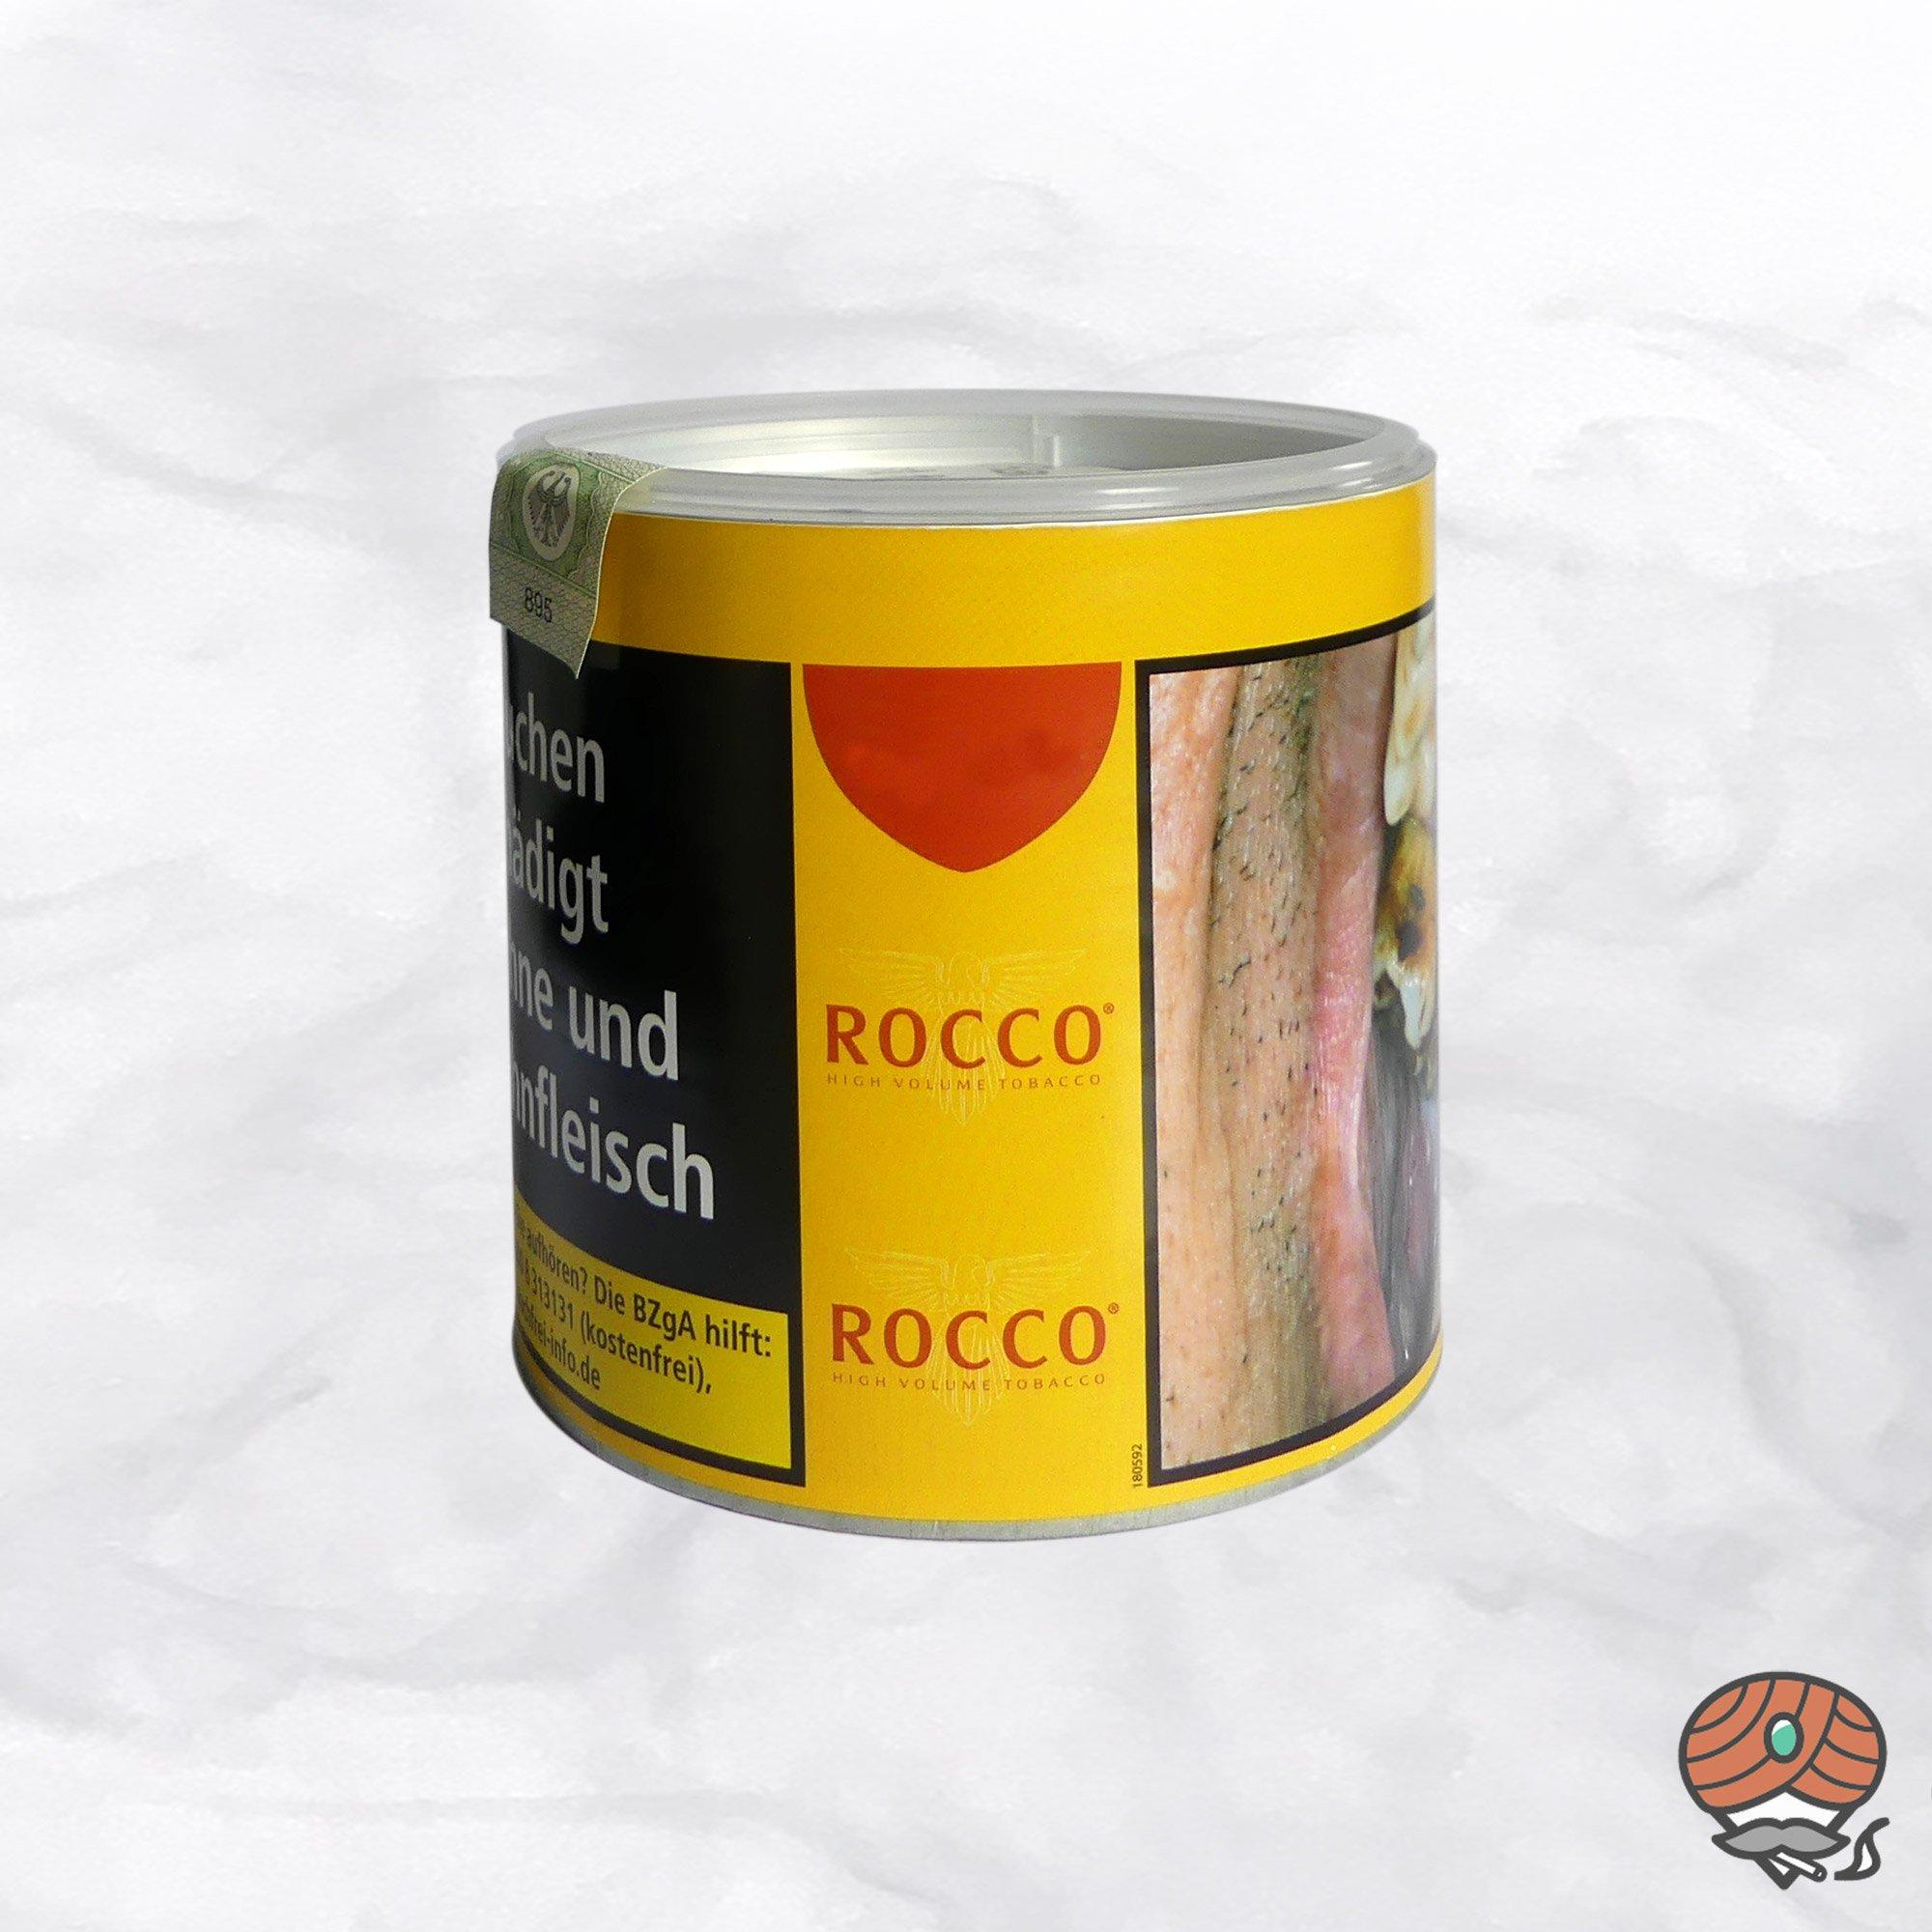 ROCCO Tabak / Volumentabak Gelb Dose 35 g